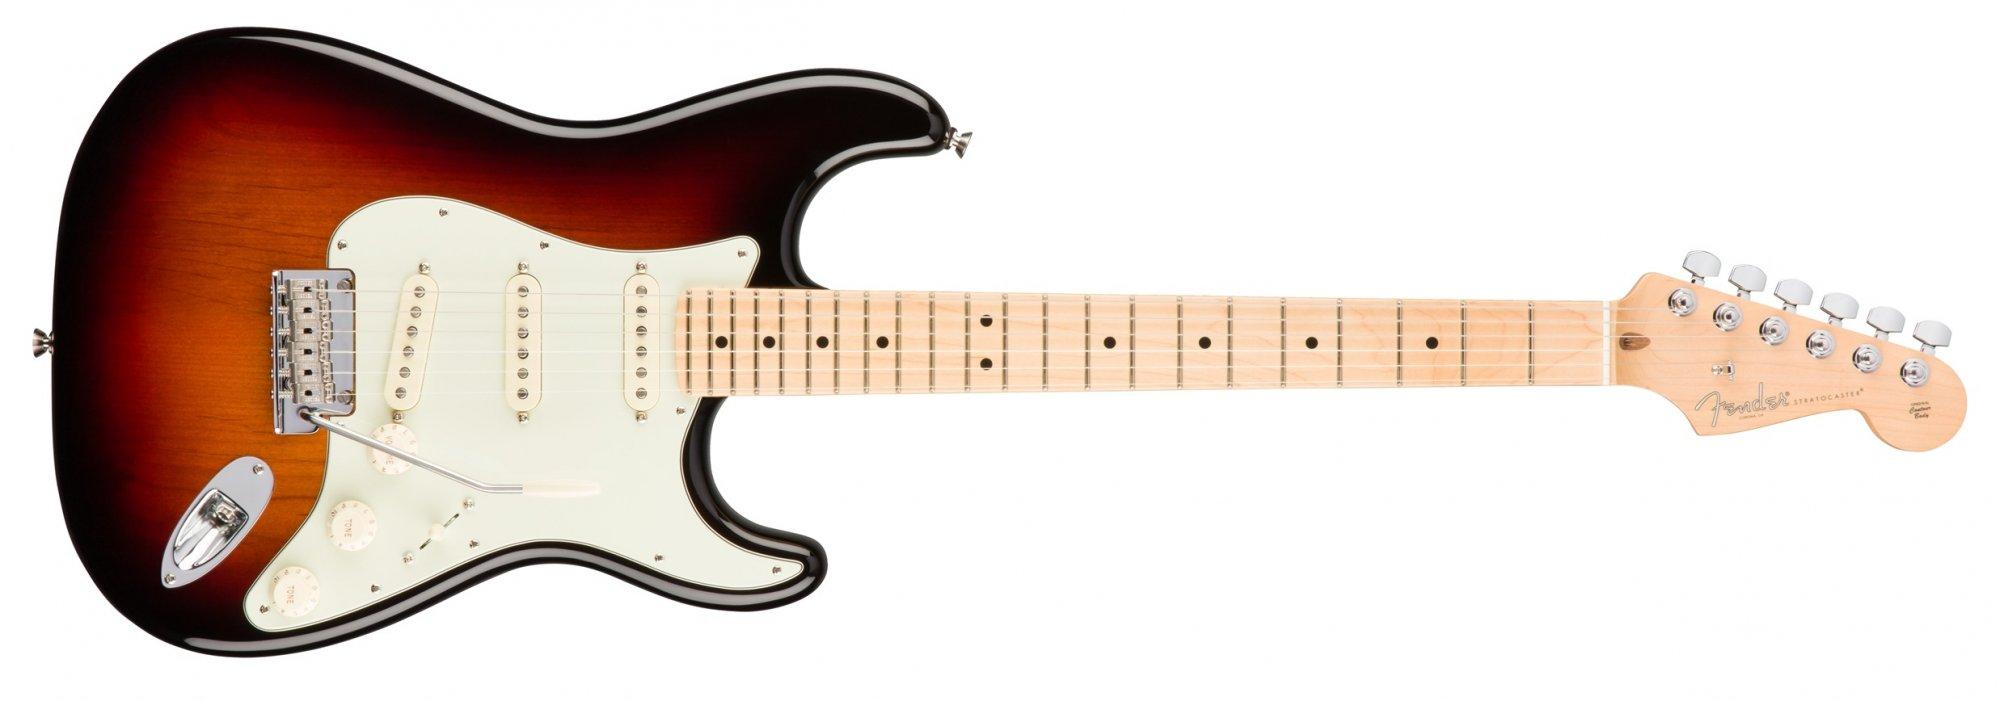 Fender American Pro Stratocaster Maple Fingerboard 3-Color Sunburst